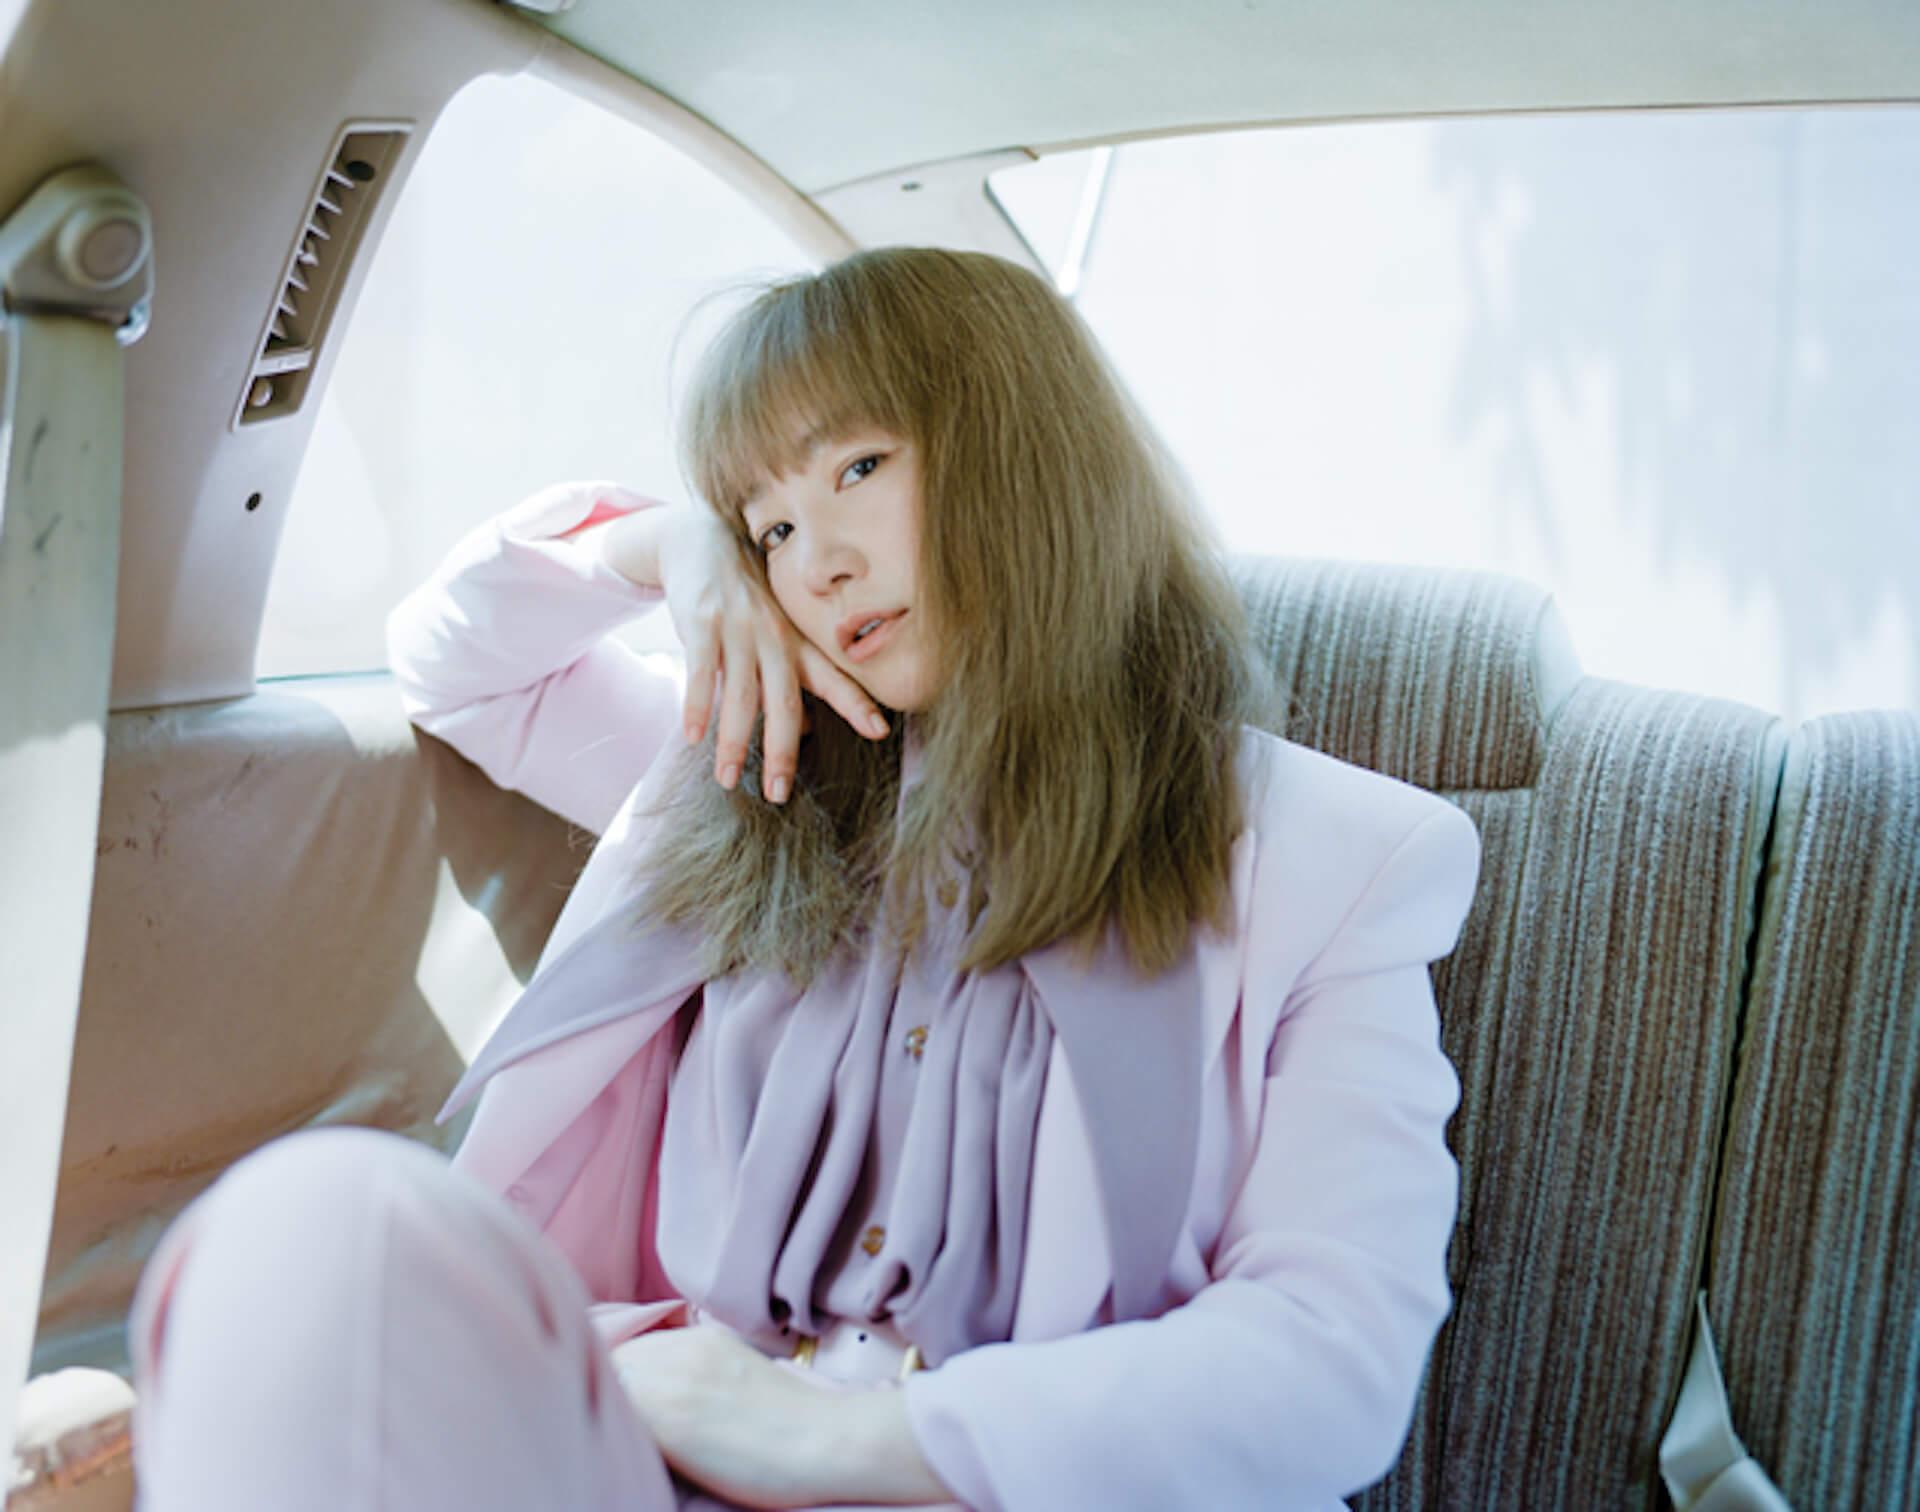 Chara+YUKIが20年の時を経てついに再始動!シングル&ミニアルバムが発売決定|東京・大阪ではライブも music191126_chara_yuki_2